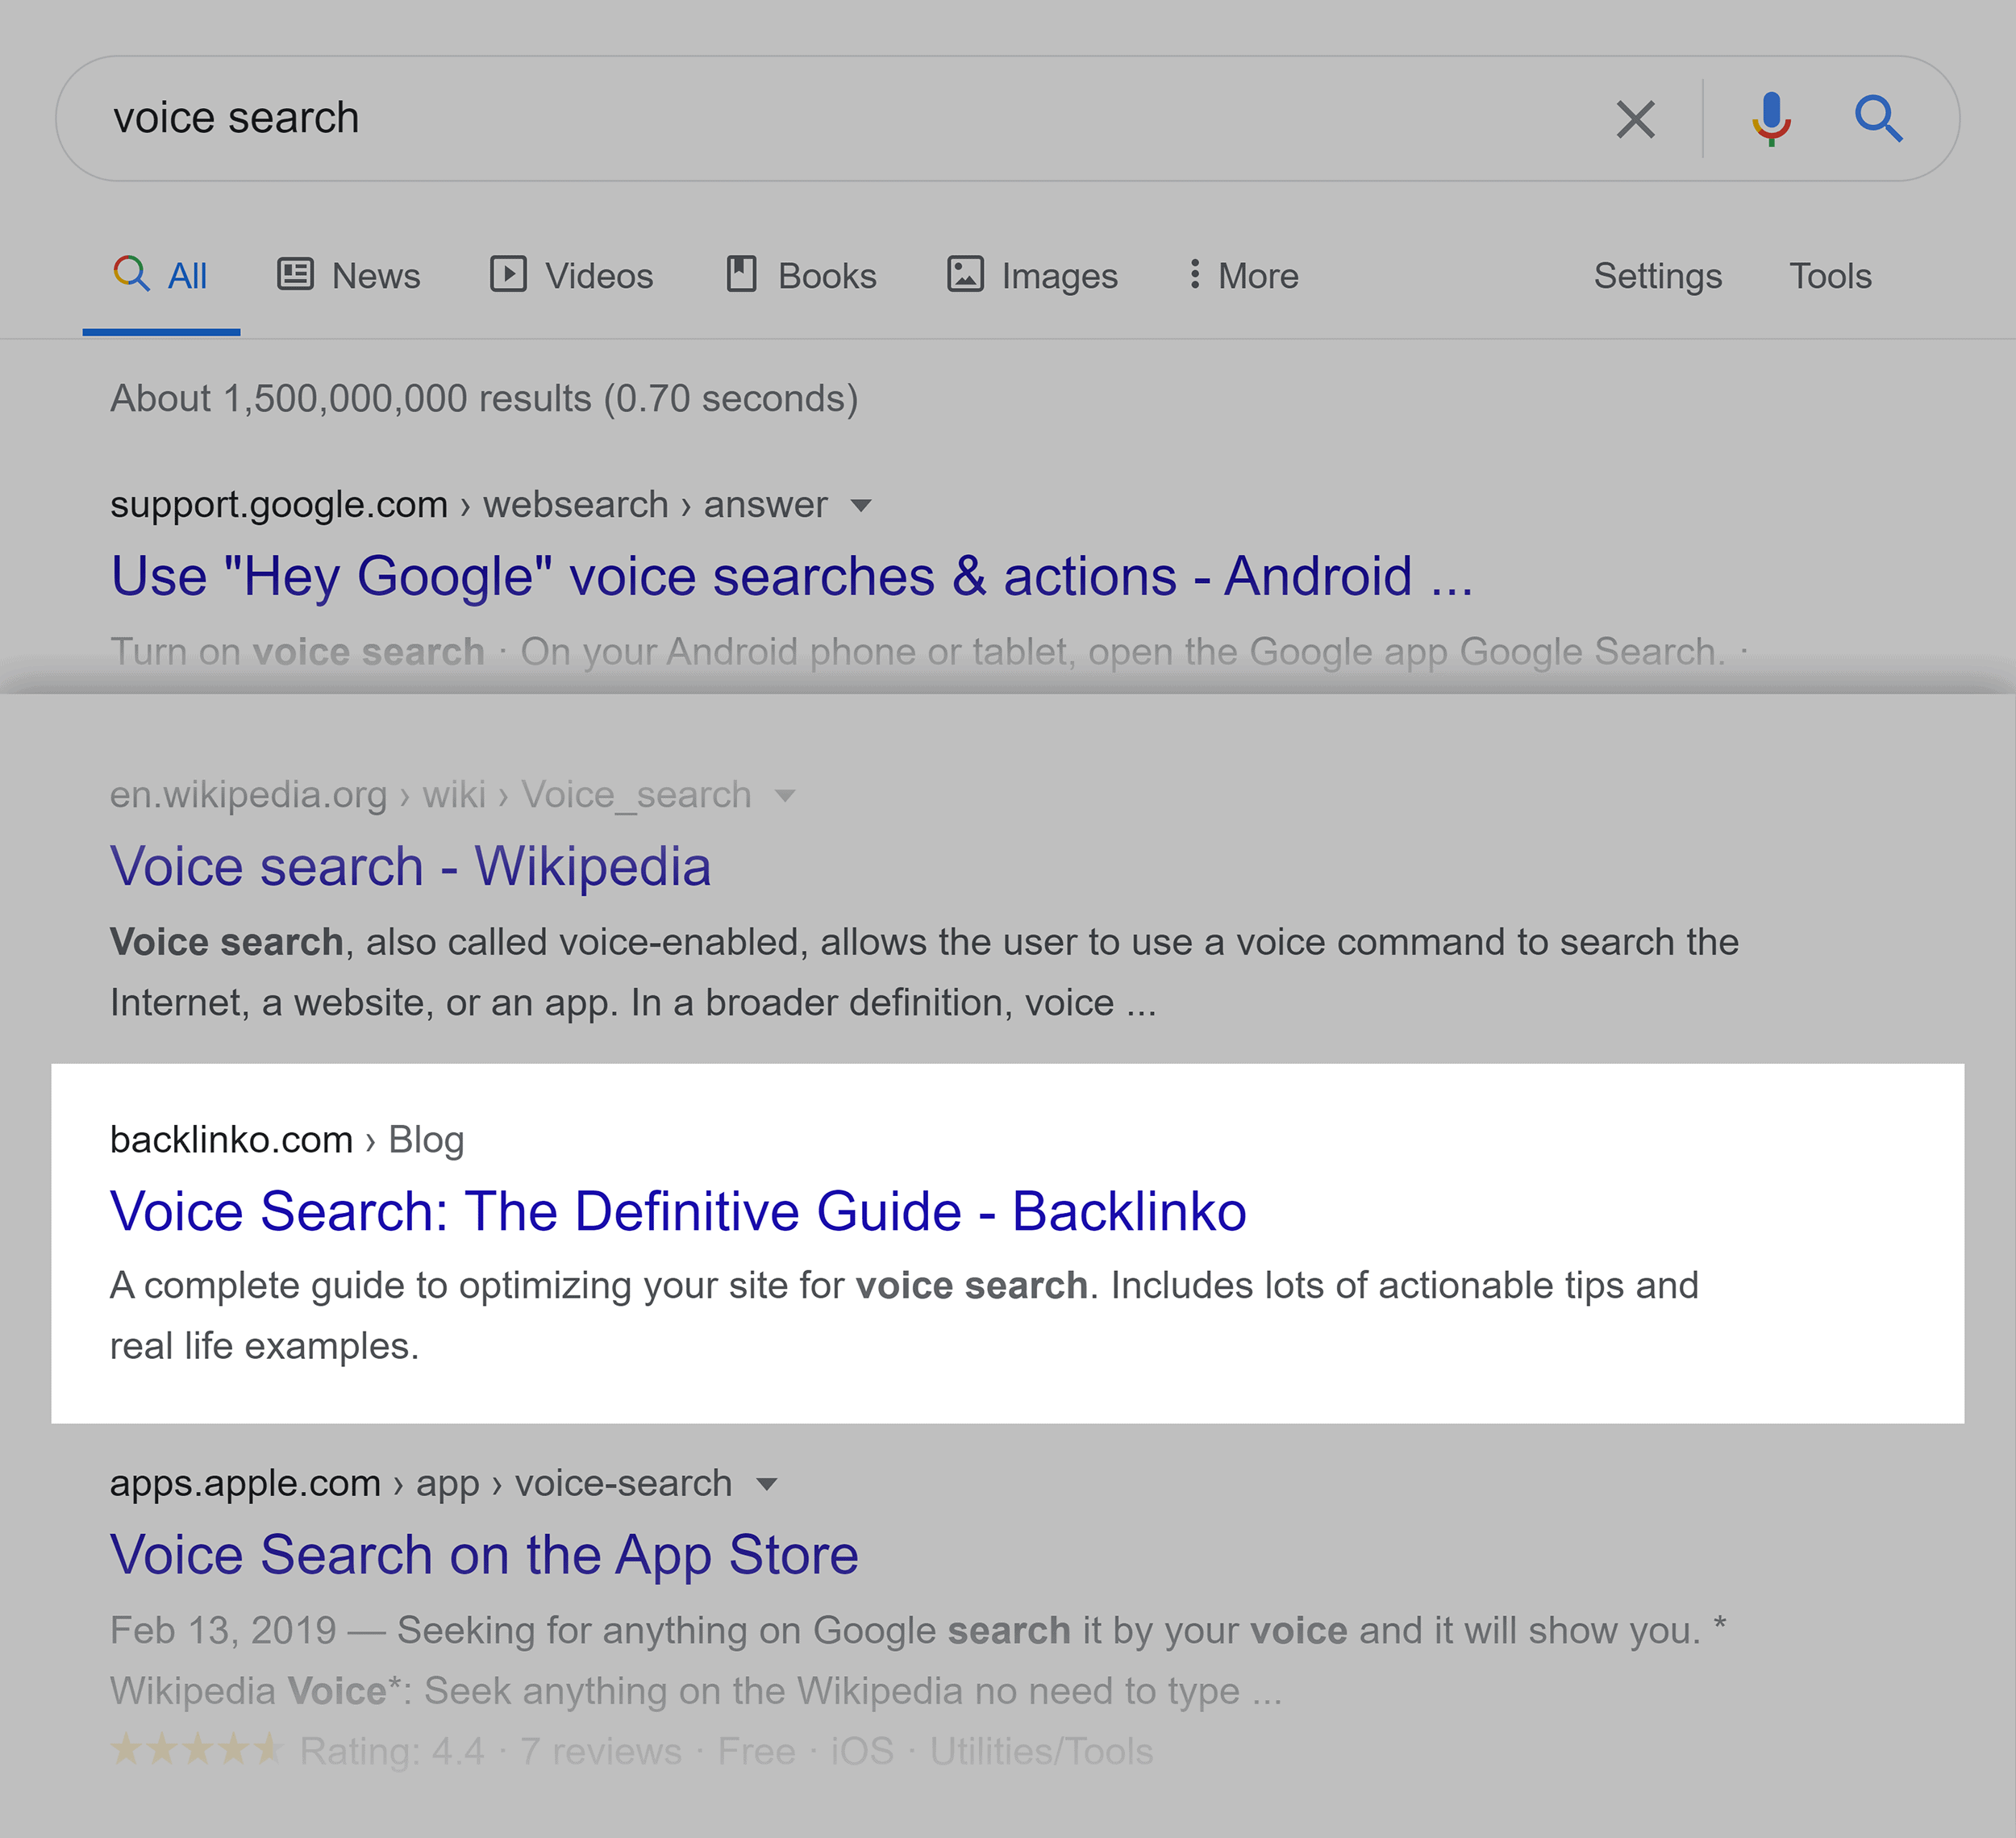 Google SERP – Voice search